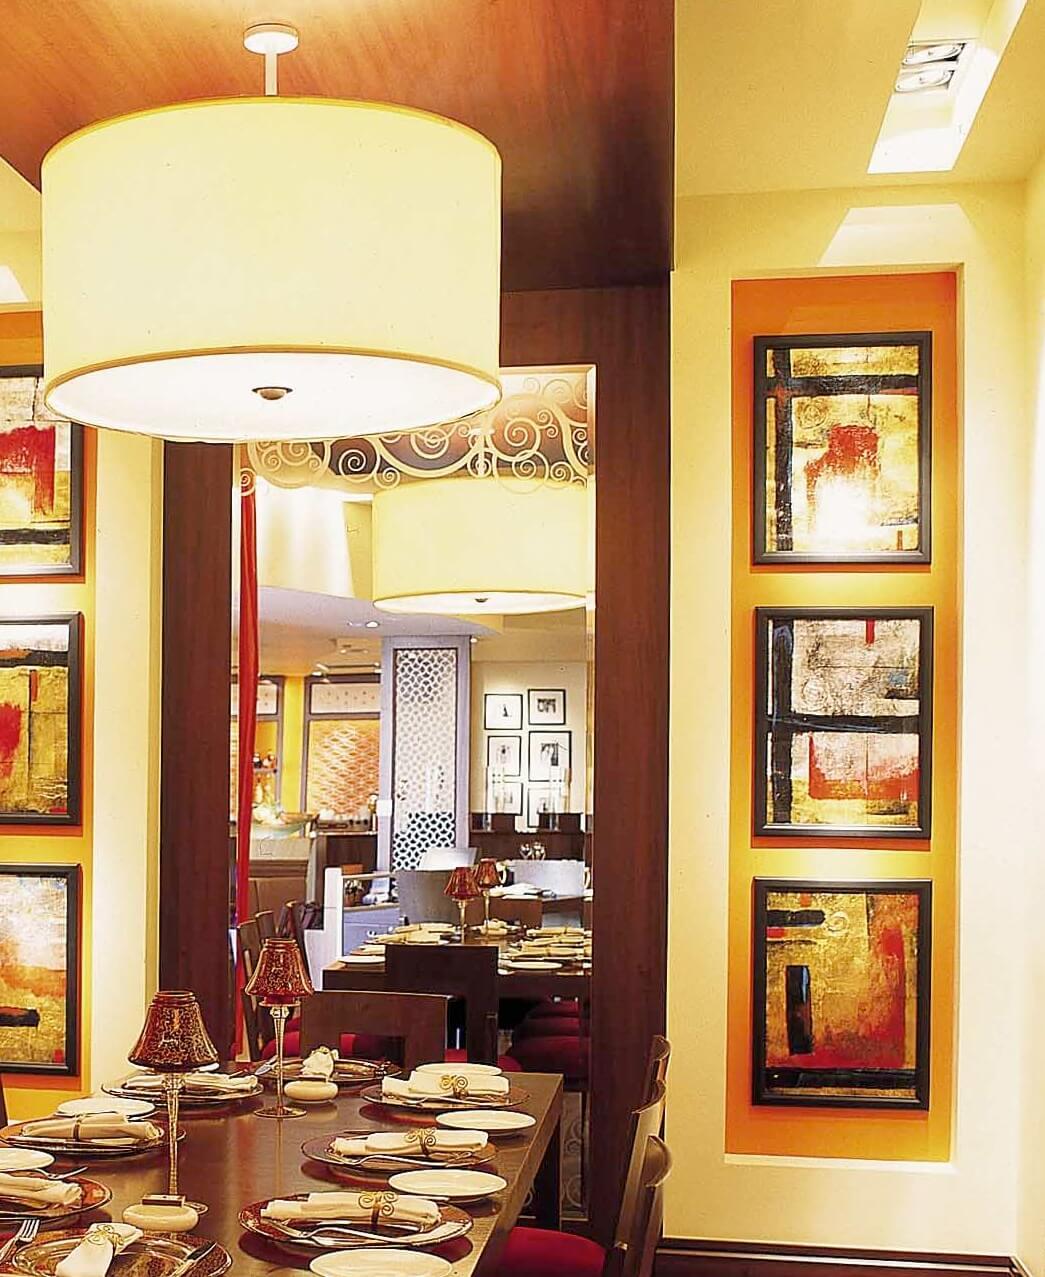 Indian Restaurant Interiors InteriorSense Commercial Design Project Consultant Cornwall